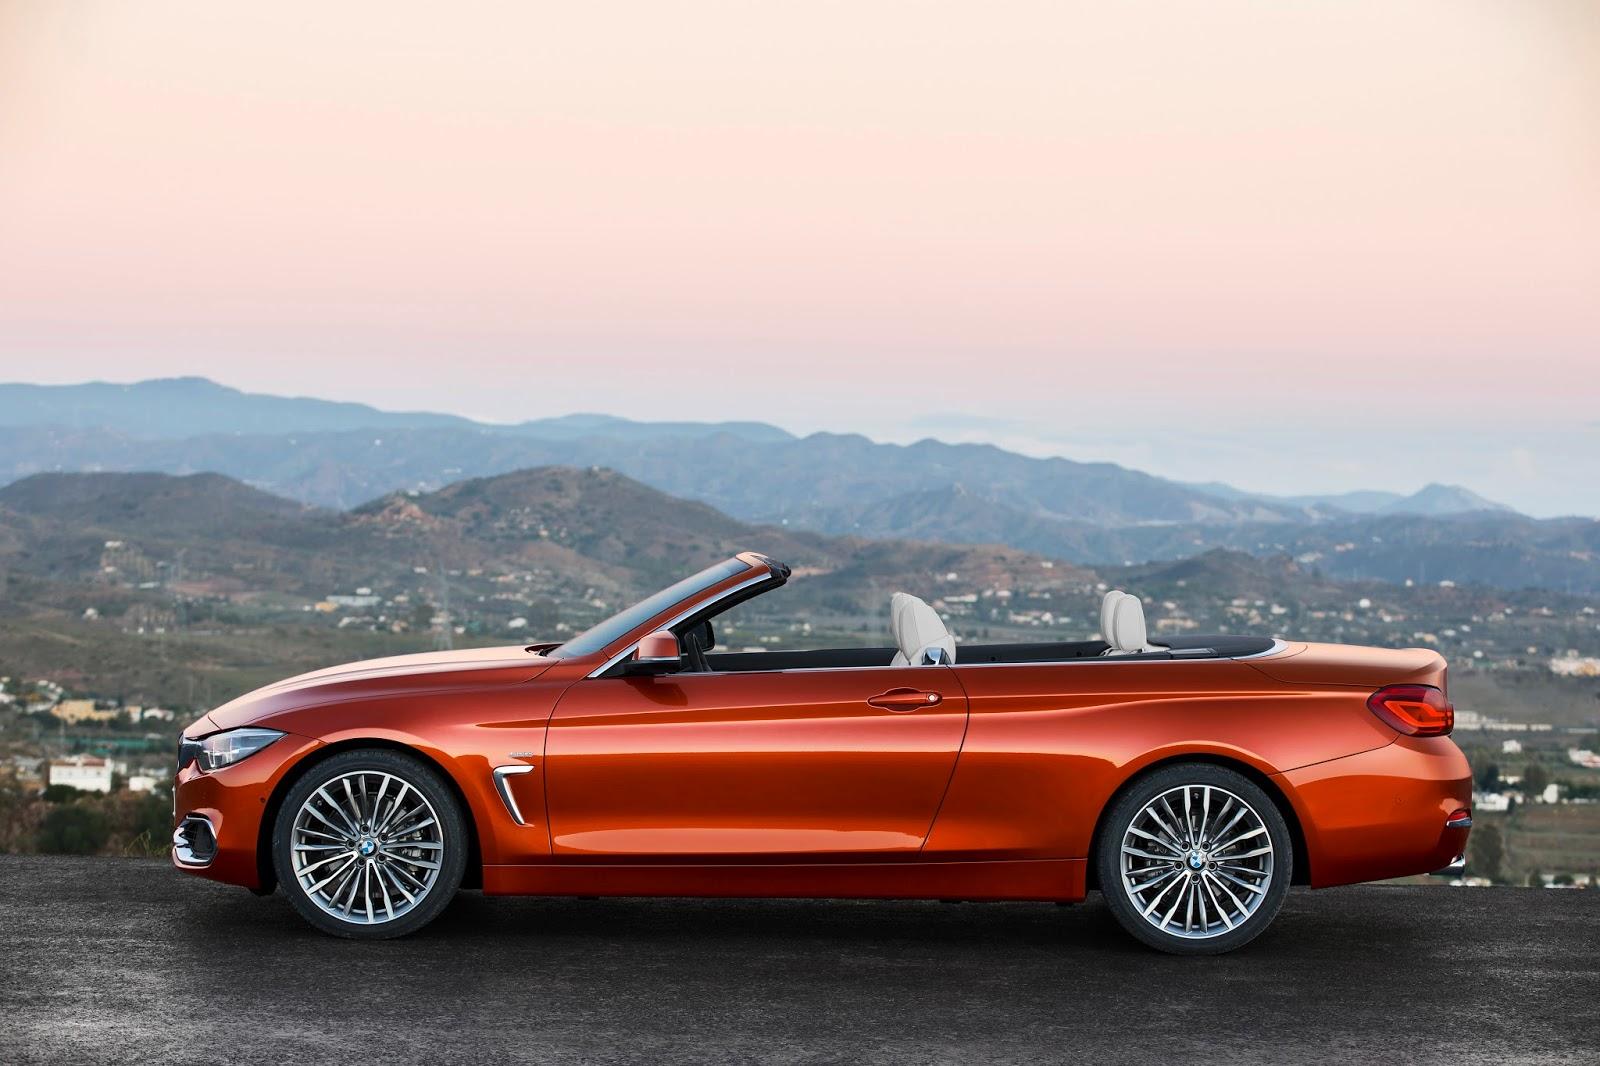 P90245266 highRes bmw 4 series luxury Η νέα BMW Σειρά 4, με πιο σφιχτή ρύθμιση ανάρτησης BMW, Bmw 4, BMW 4 Cabrio, BMW 4 Coupe, BMW 4 Gran Coupé, Facelift